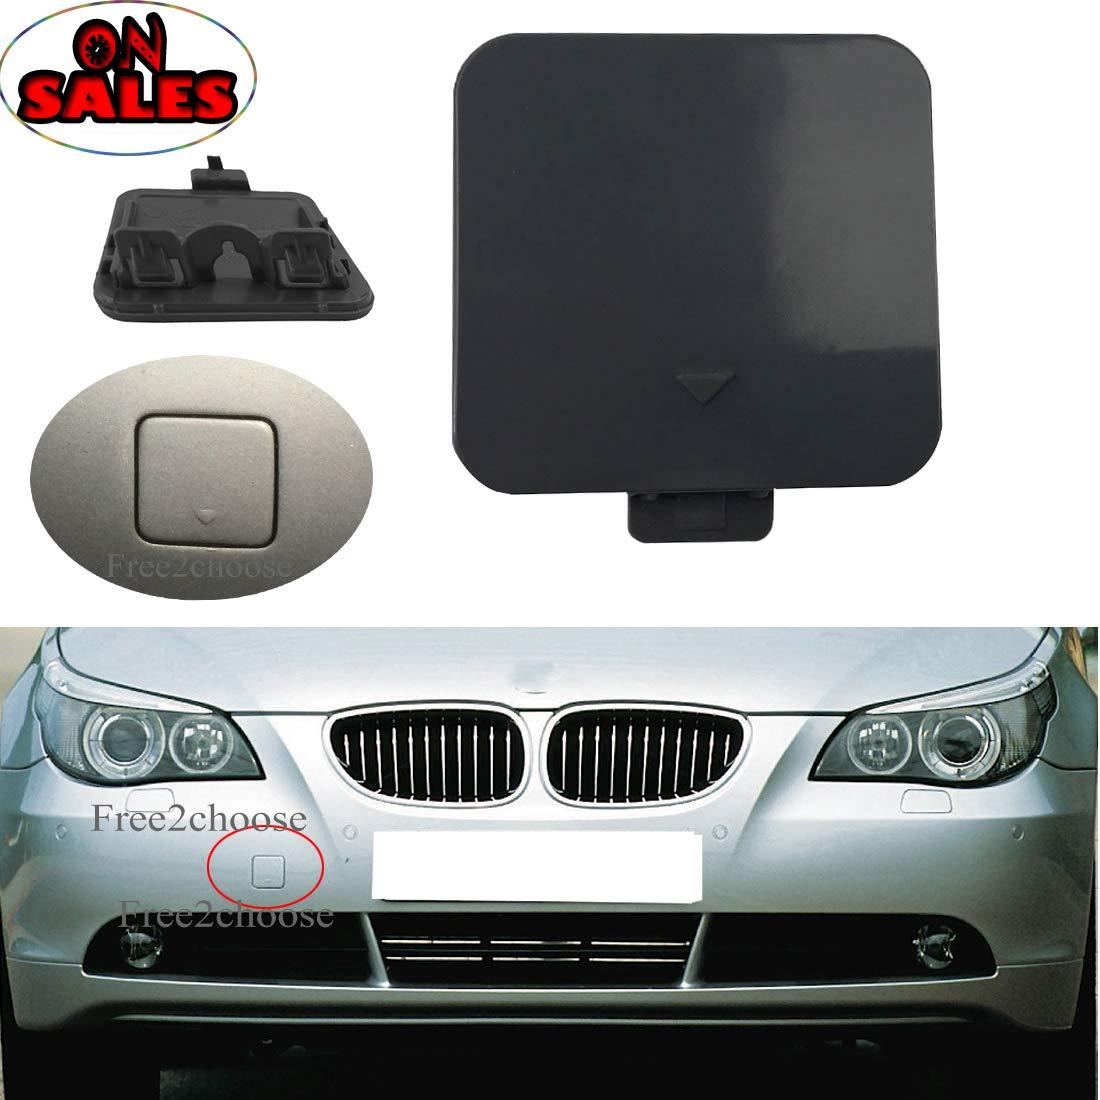 Free2choose Front Bumper Tow Hook Cover for E90 328i 335d 335i E91 2009-2011 51117207299